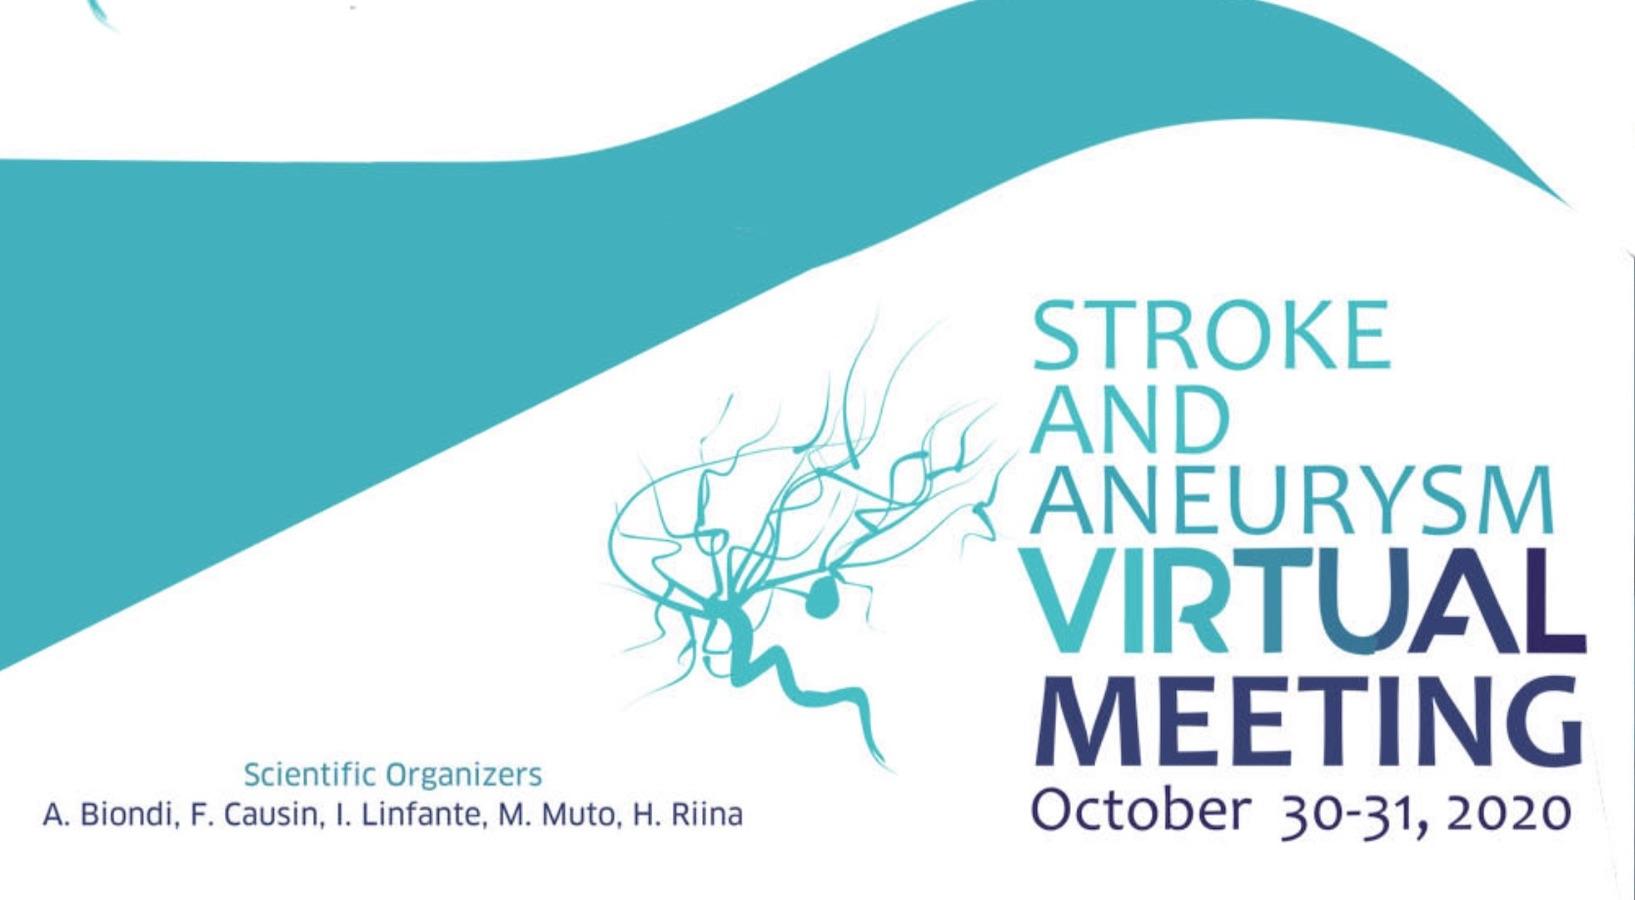 Stroke and Aneurysm Virtual Meeting 2020